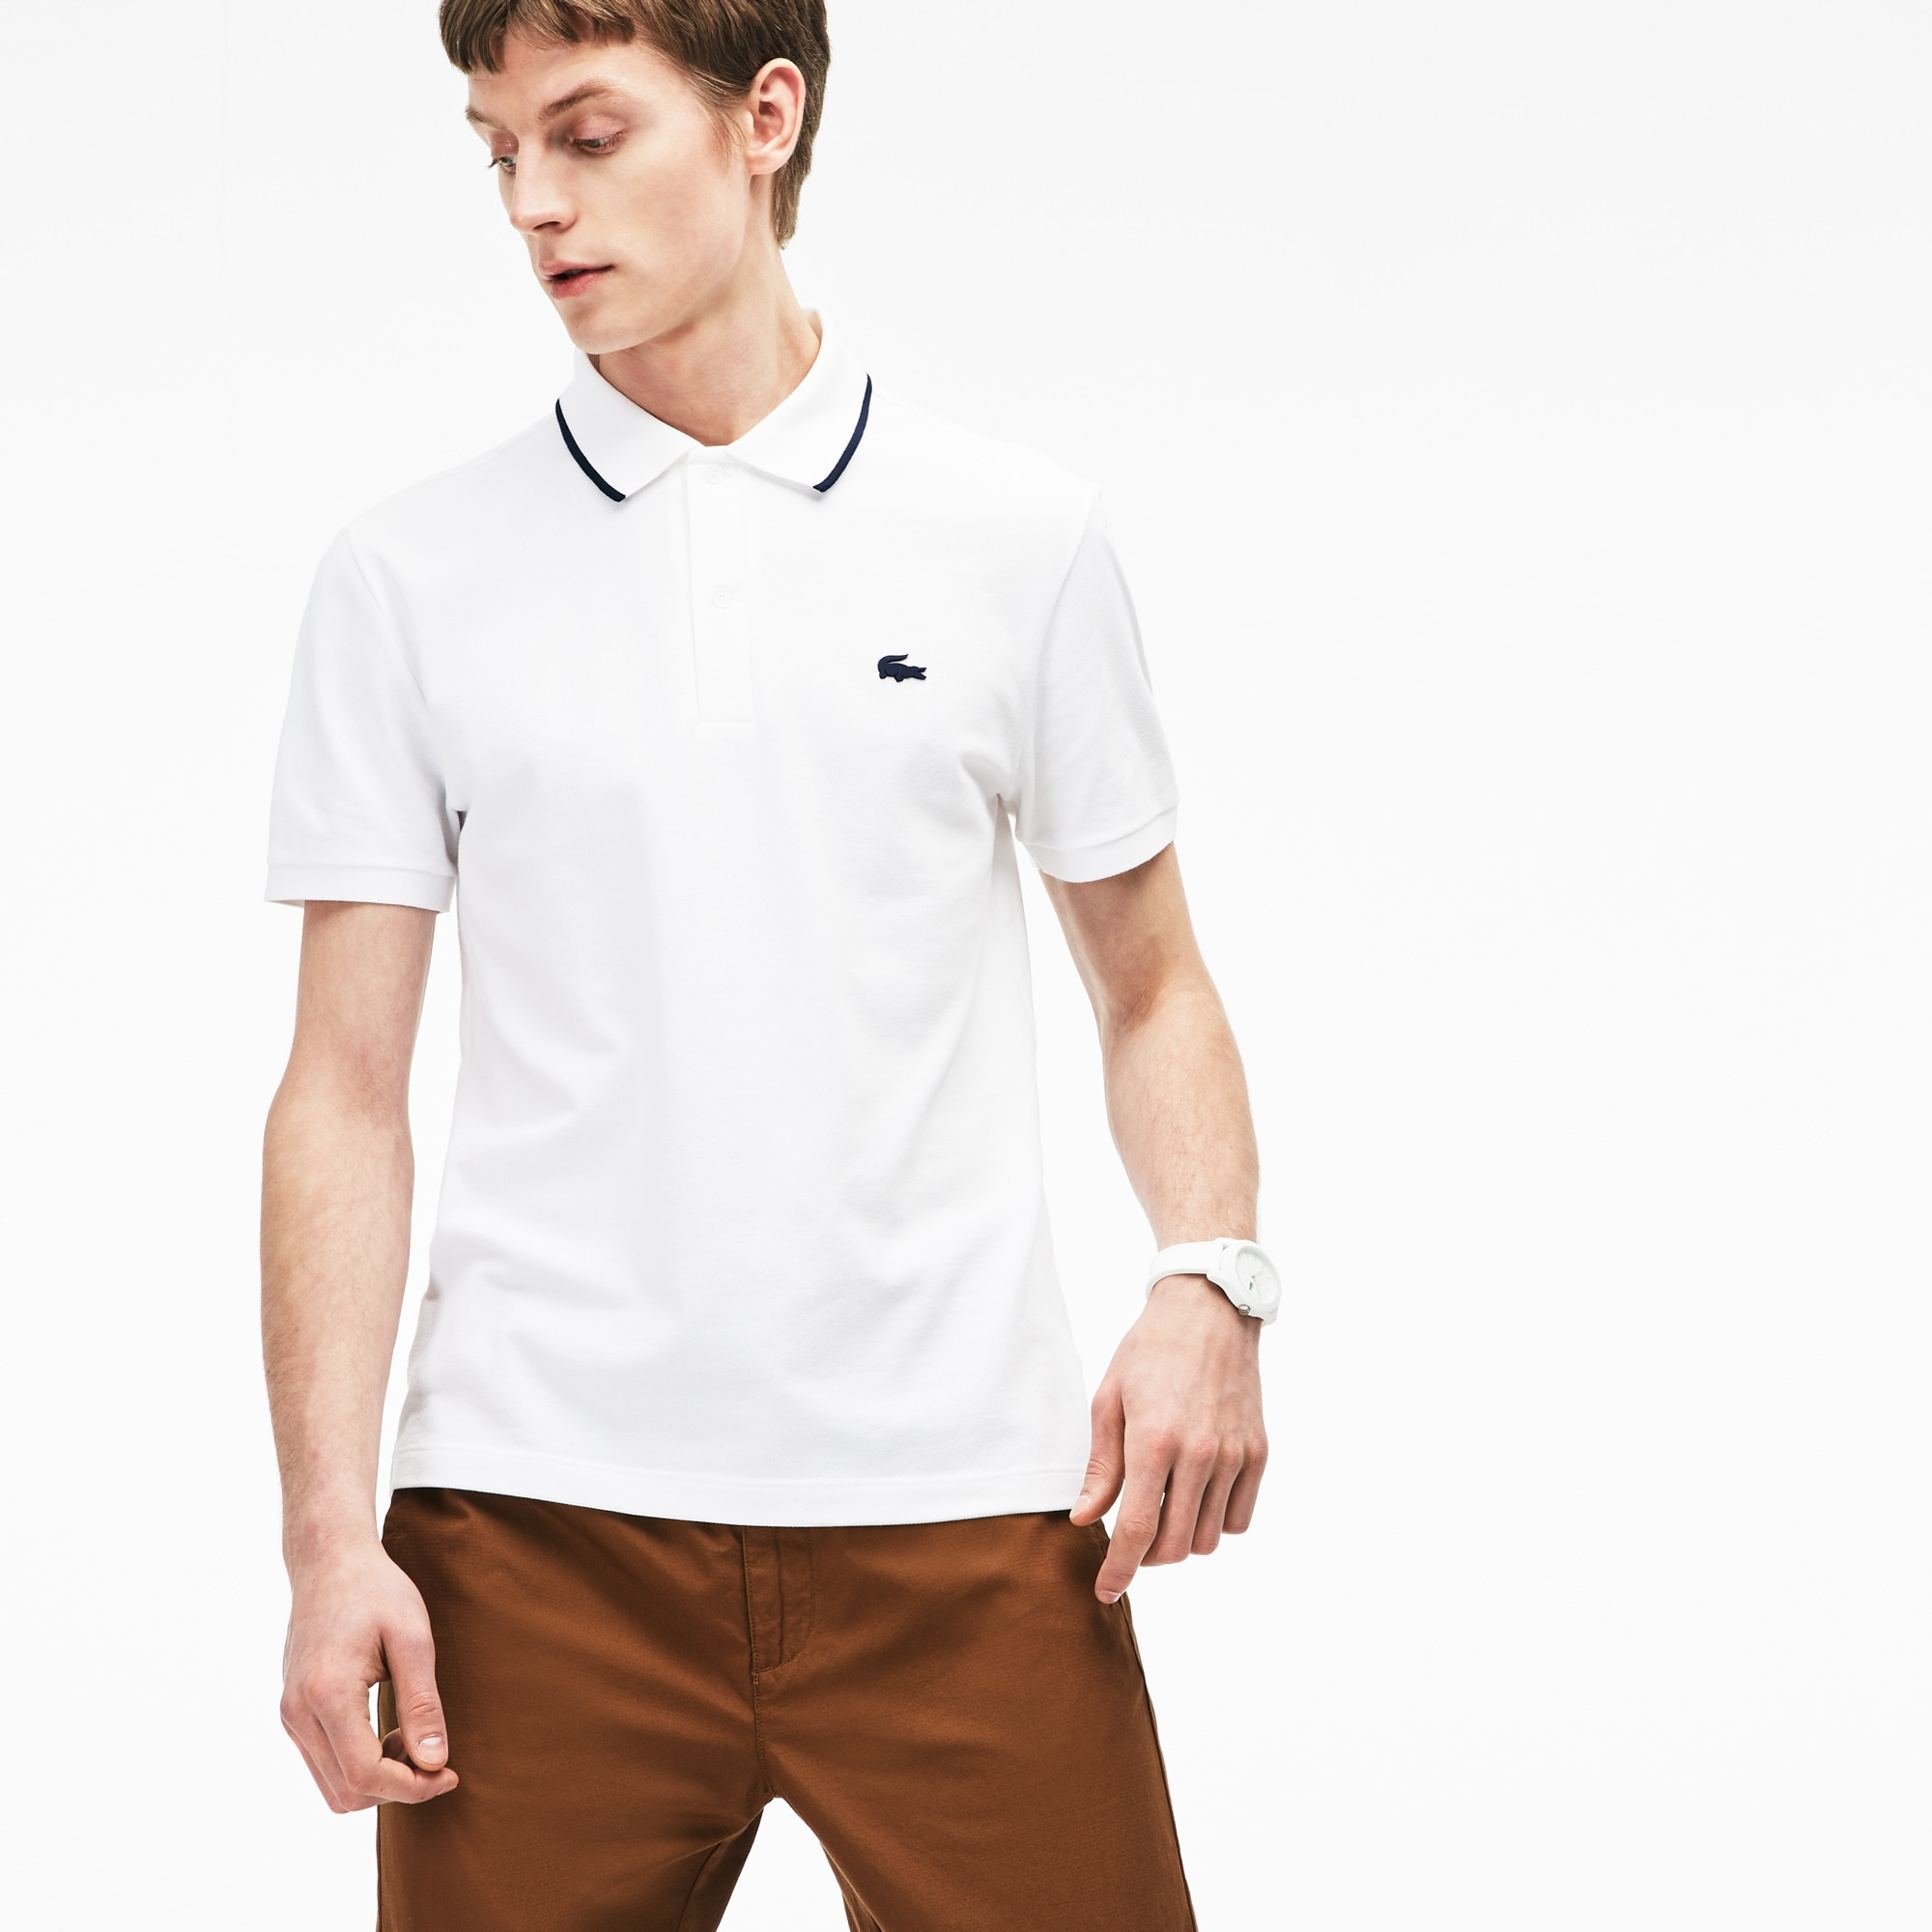 Men's Lacoste Slim Fit Piped Neck Stretch Pima Cotton Polo Shirt